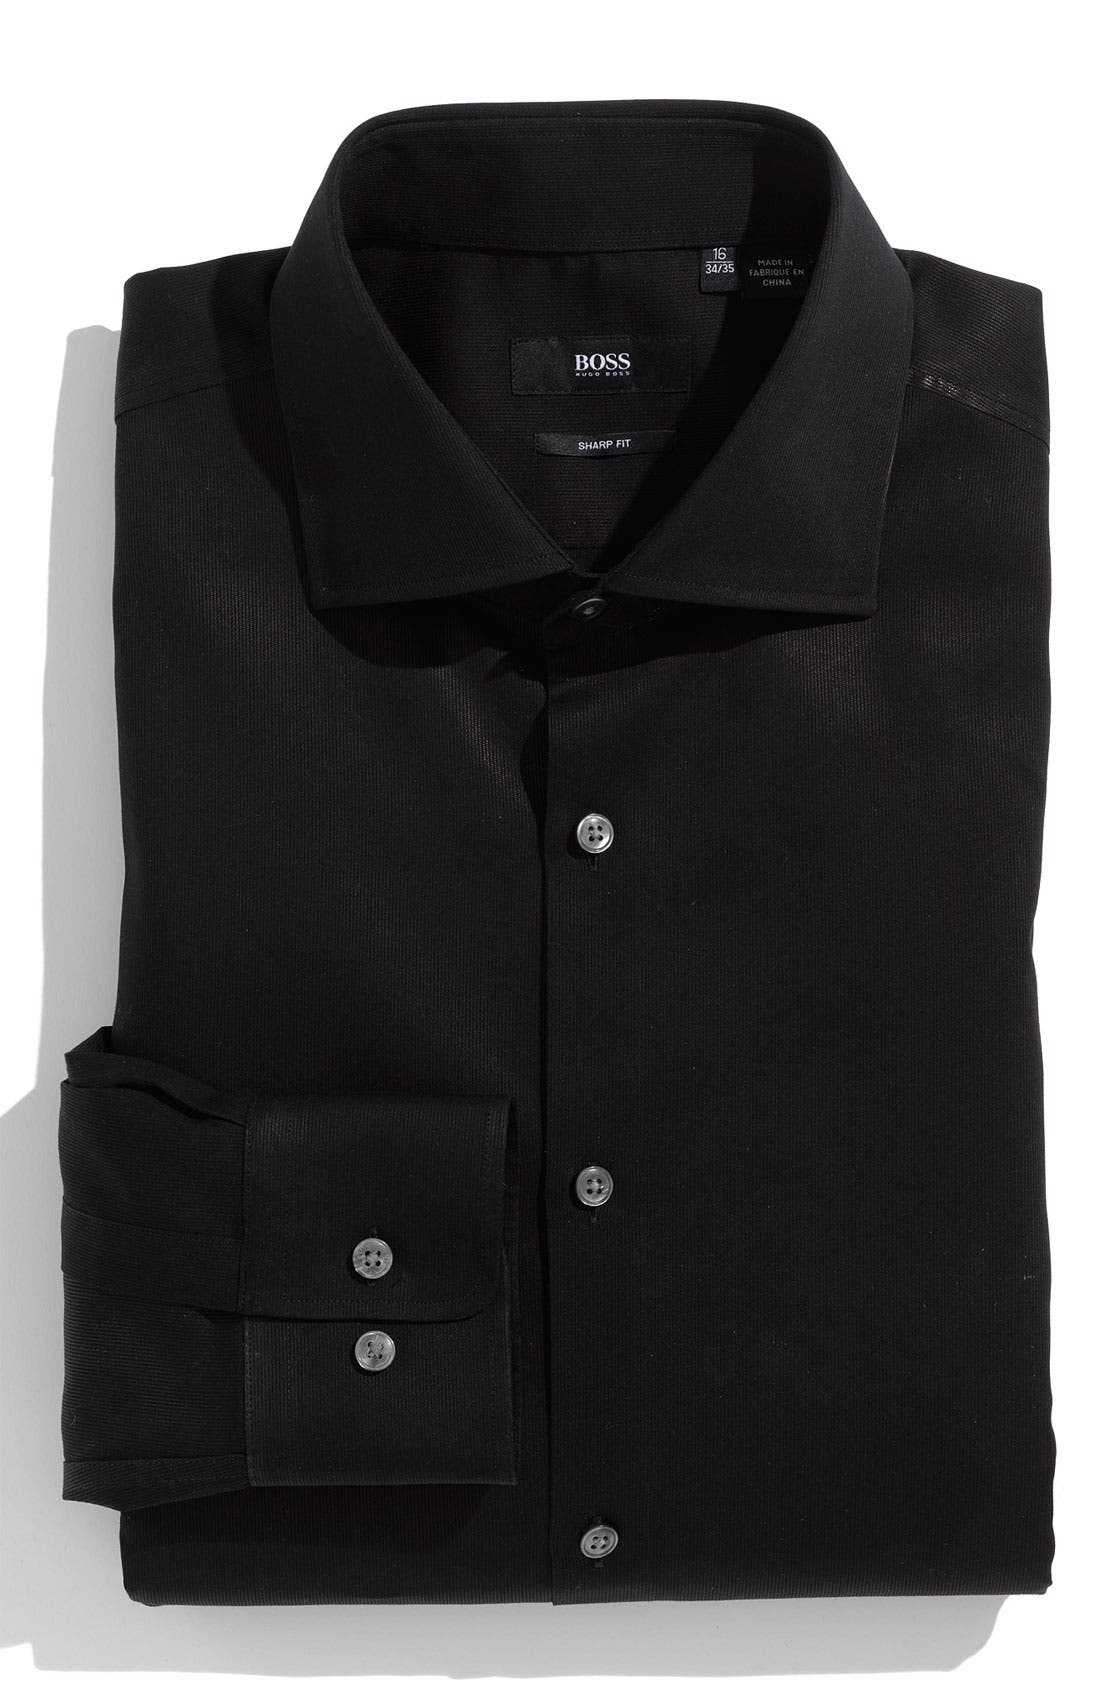 BOSS HUGO BOSS 'Miles' Sharp Fit Tonal Stripe Cotton Dress Shirt, Main, color, 001